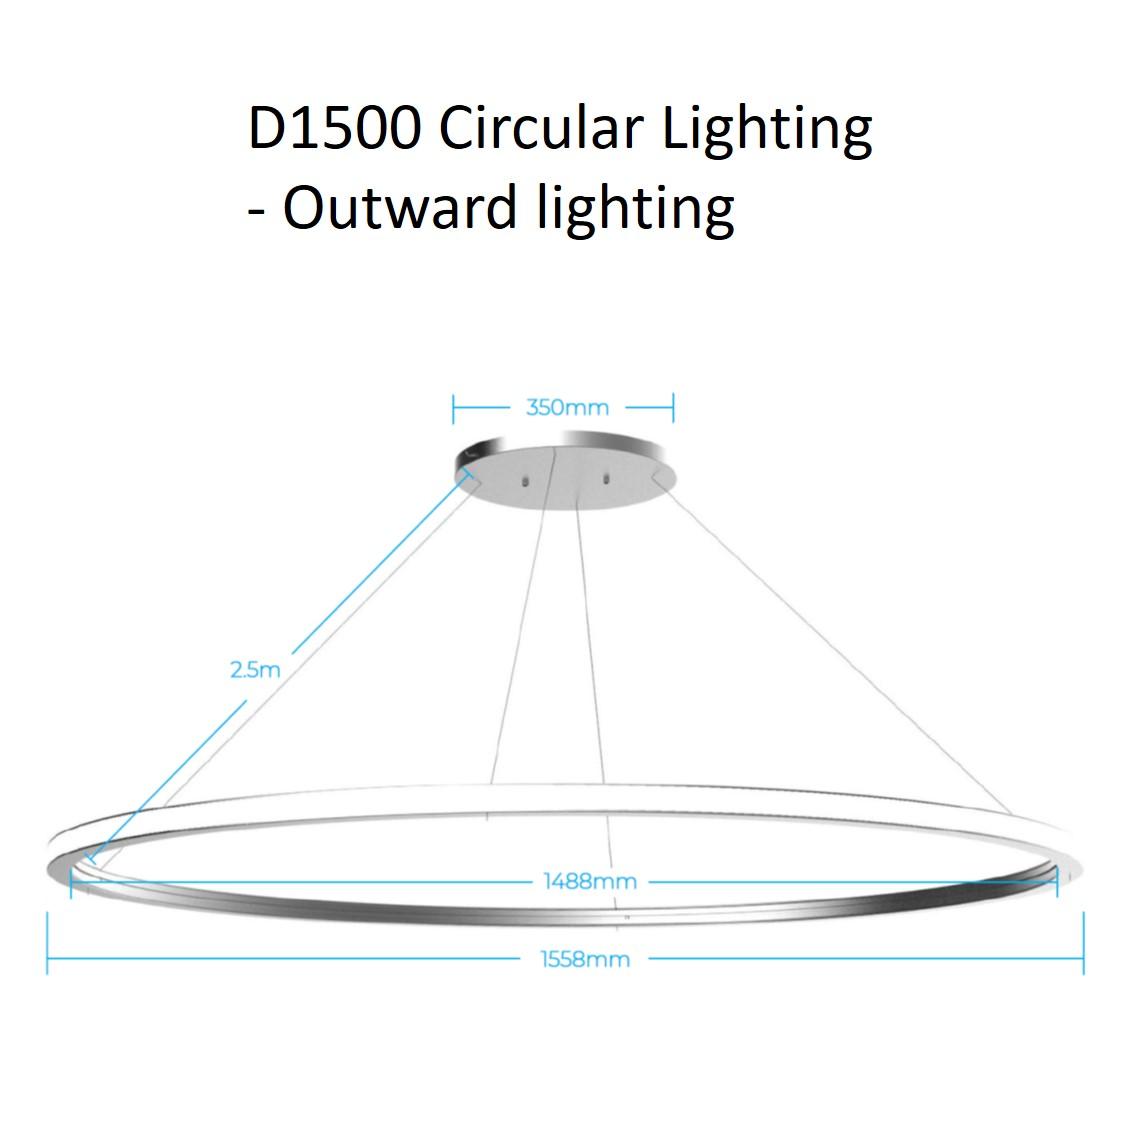 D1500 circular lighting - outward